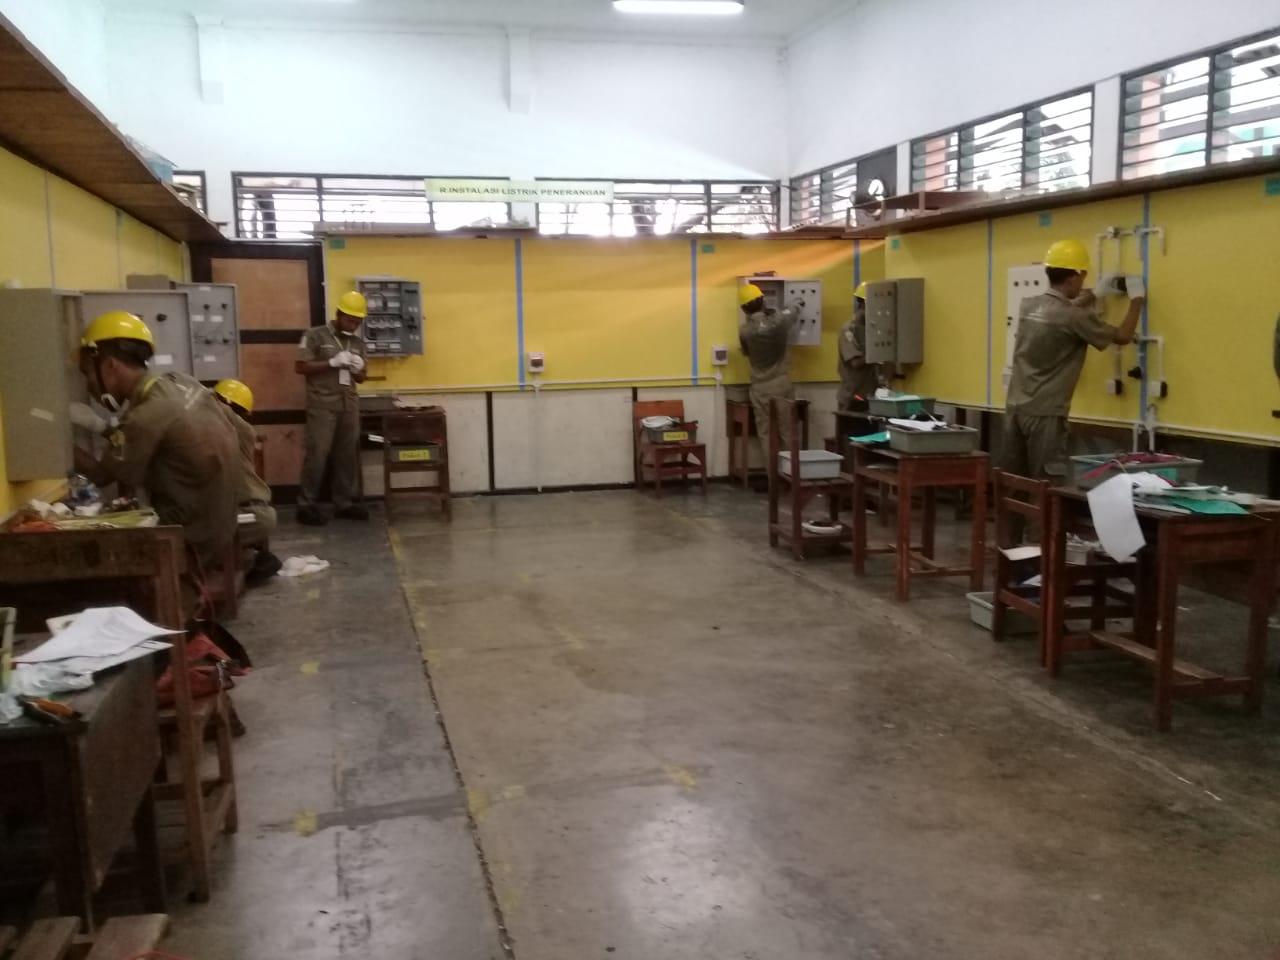 Teknik Instalasi Tenaga Listrik SMK Negeri 1 Cerme Gresik